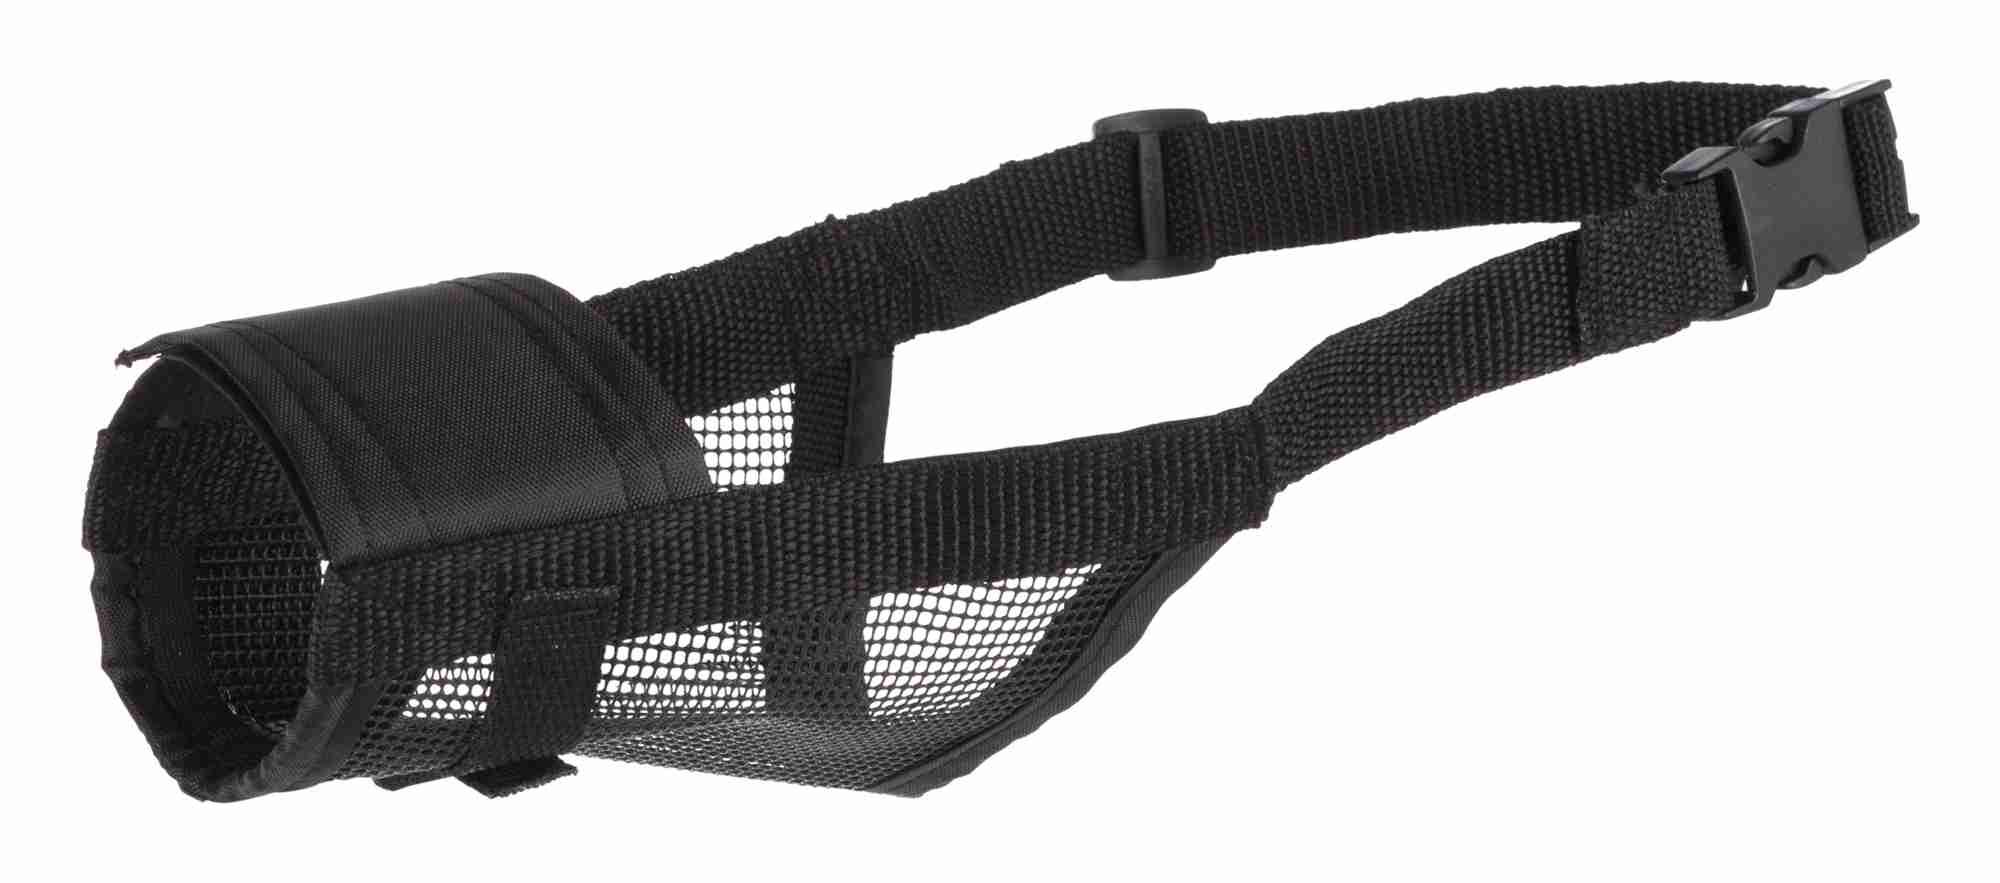 TRIXIE Maulkorb mit Netzeinsatz, Polyester TRIXIE Maulkorb mit Netzeinsatz, Polyester, L: 26–42 cm, schwarz